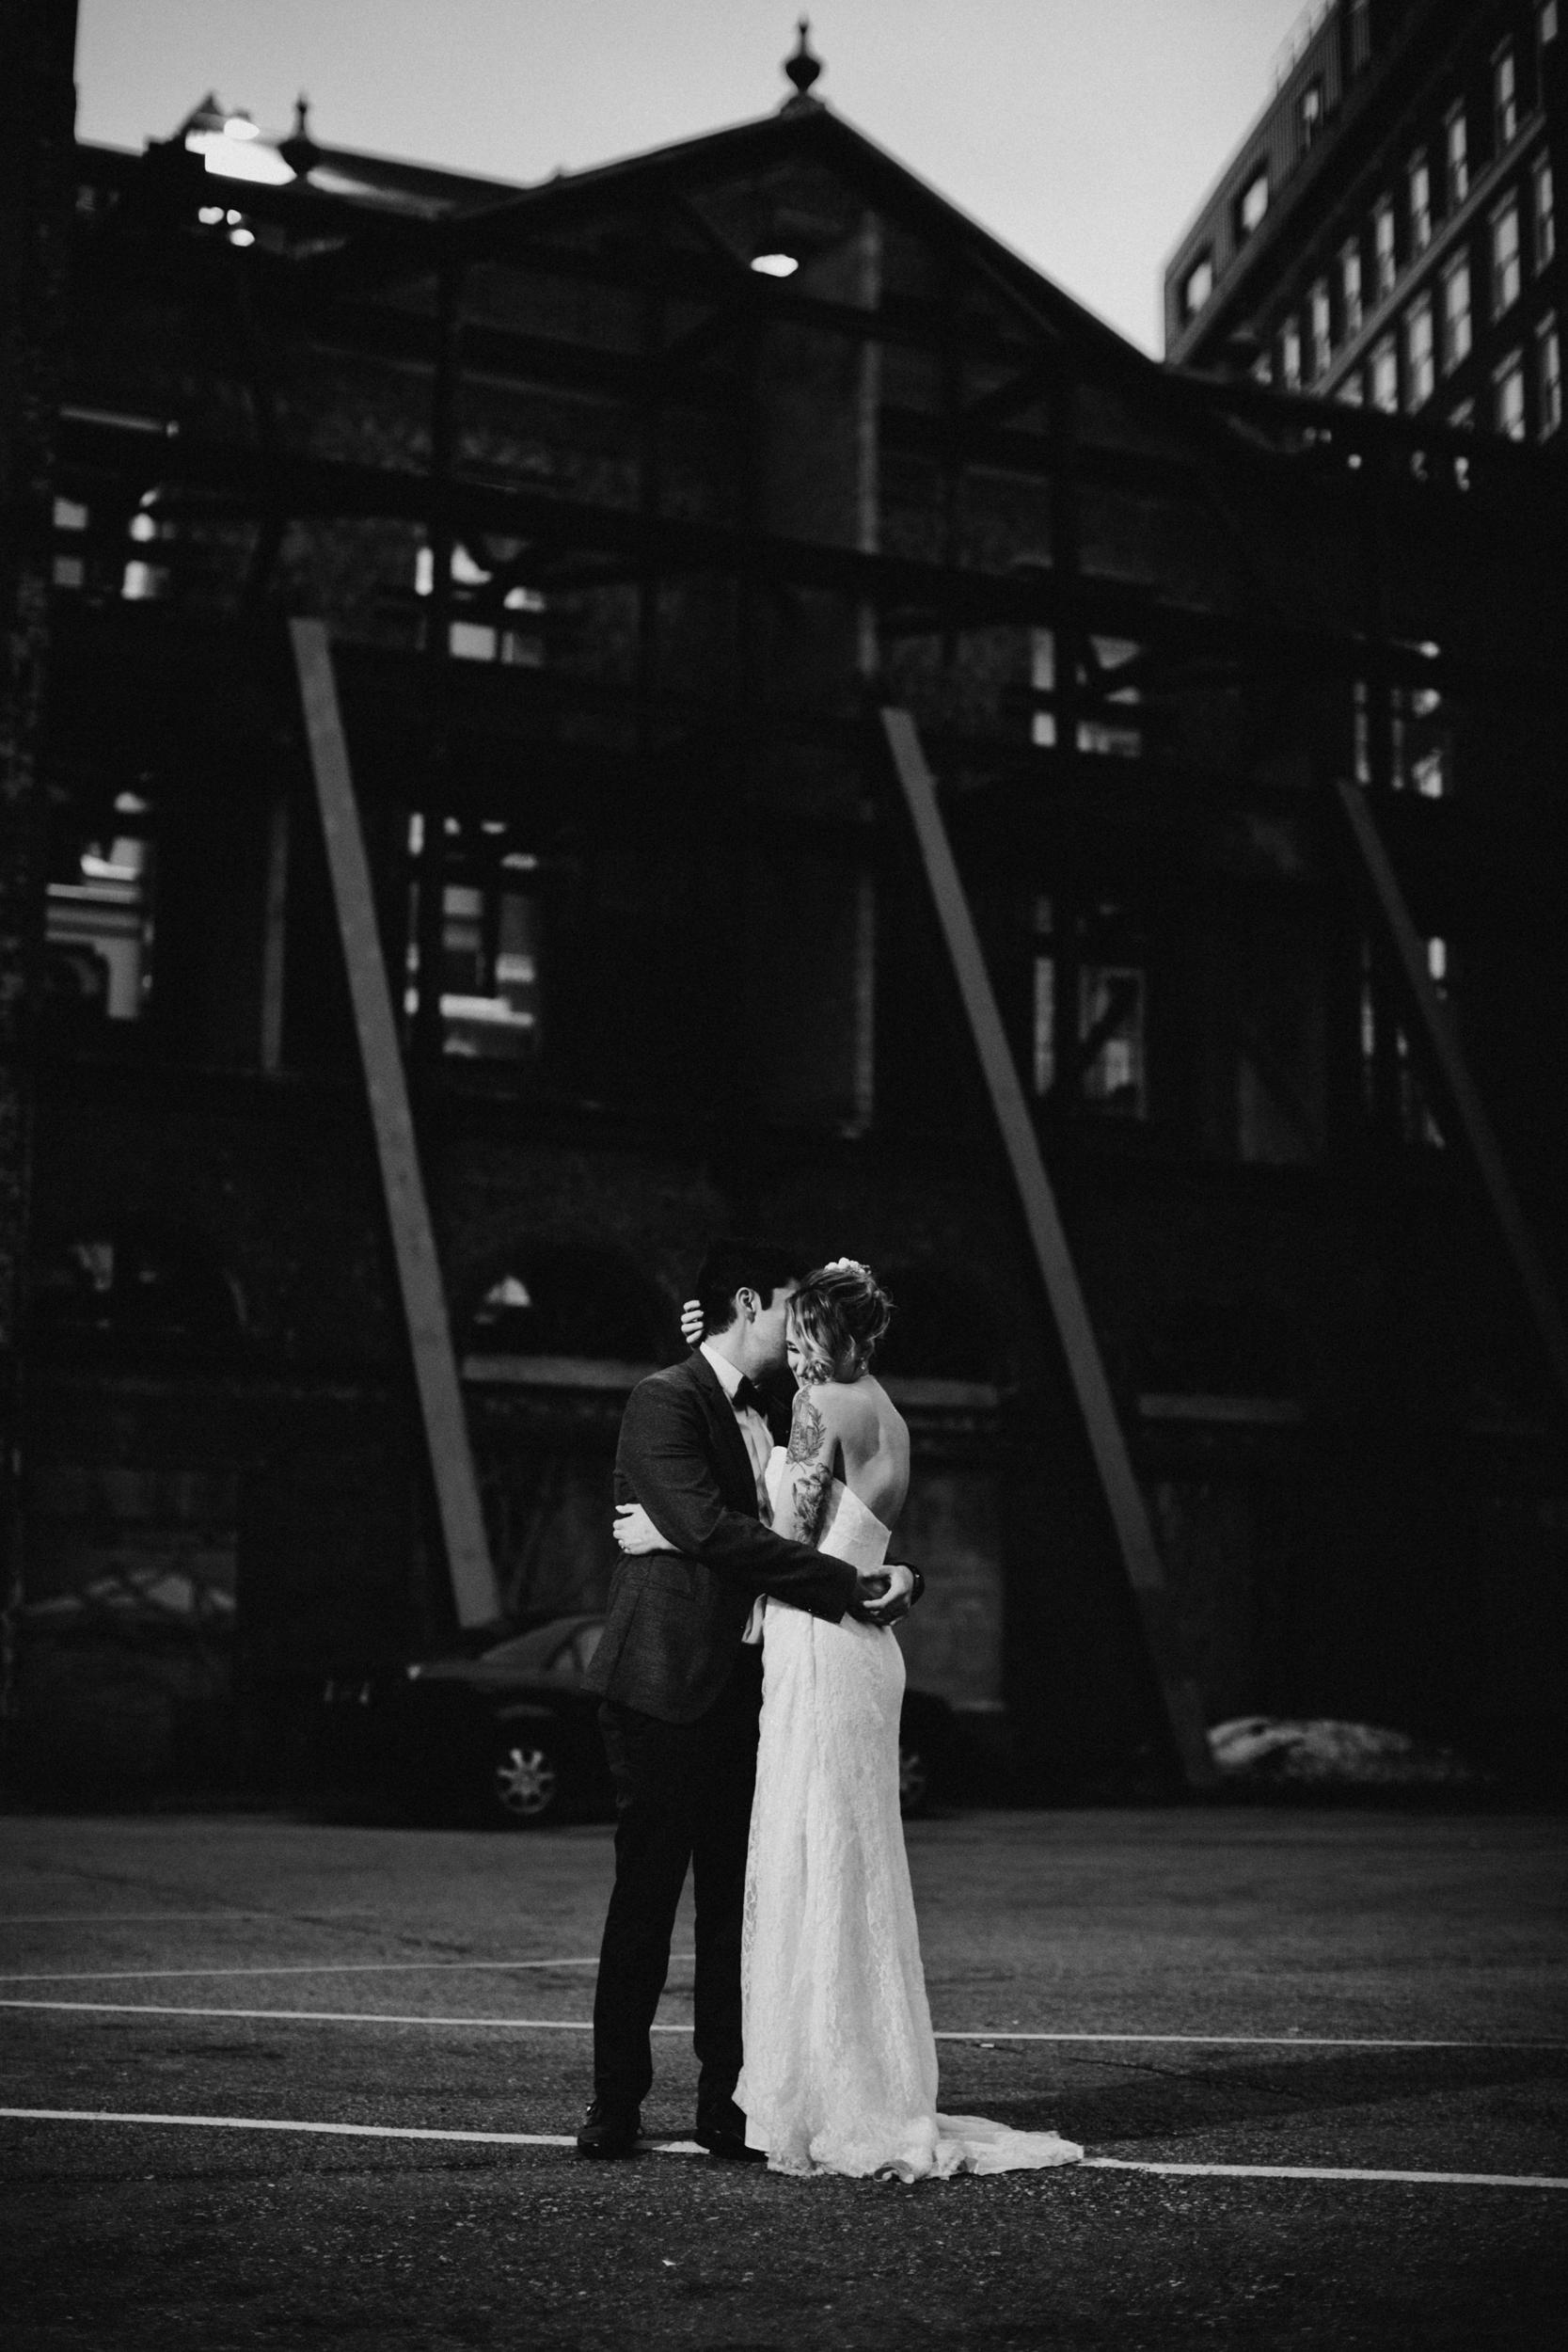 providence-wedding-photographer-128.jpg